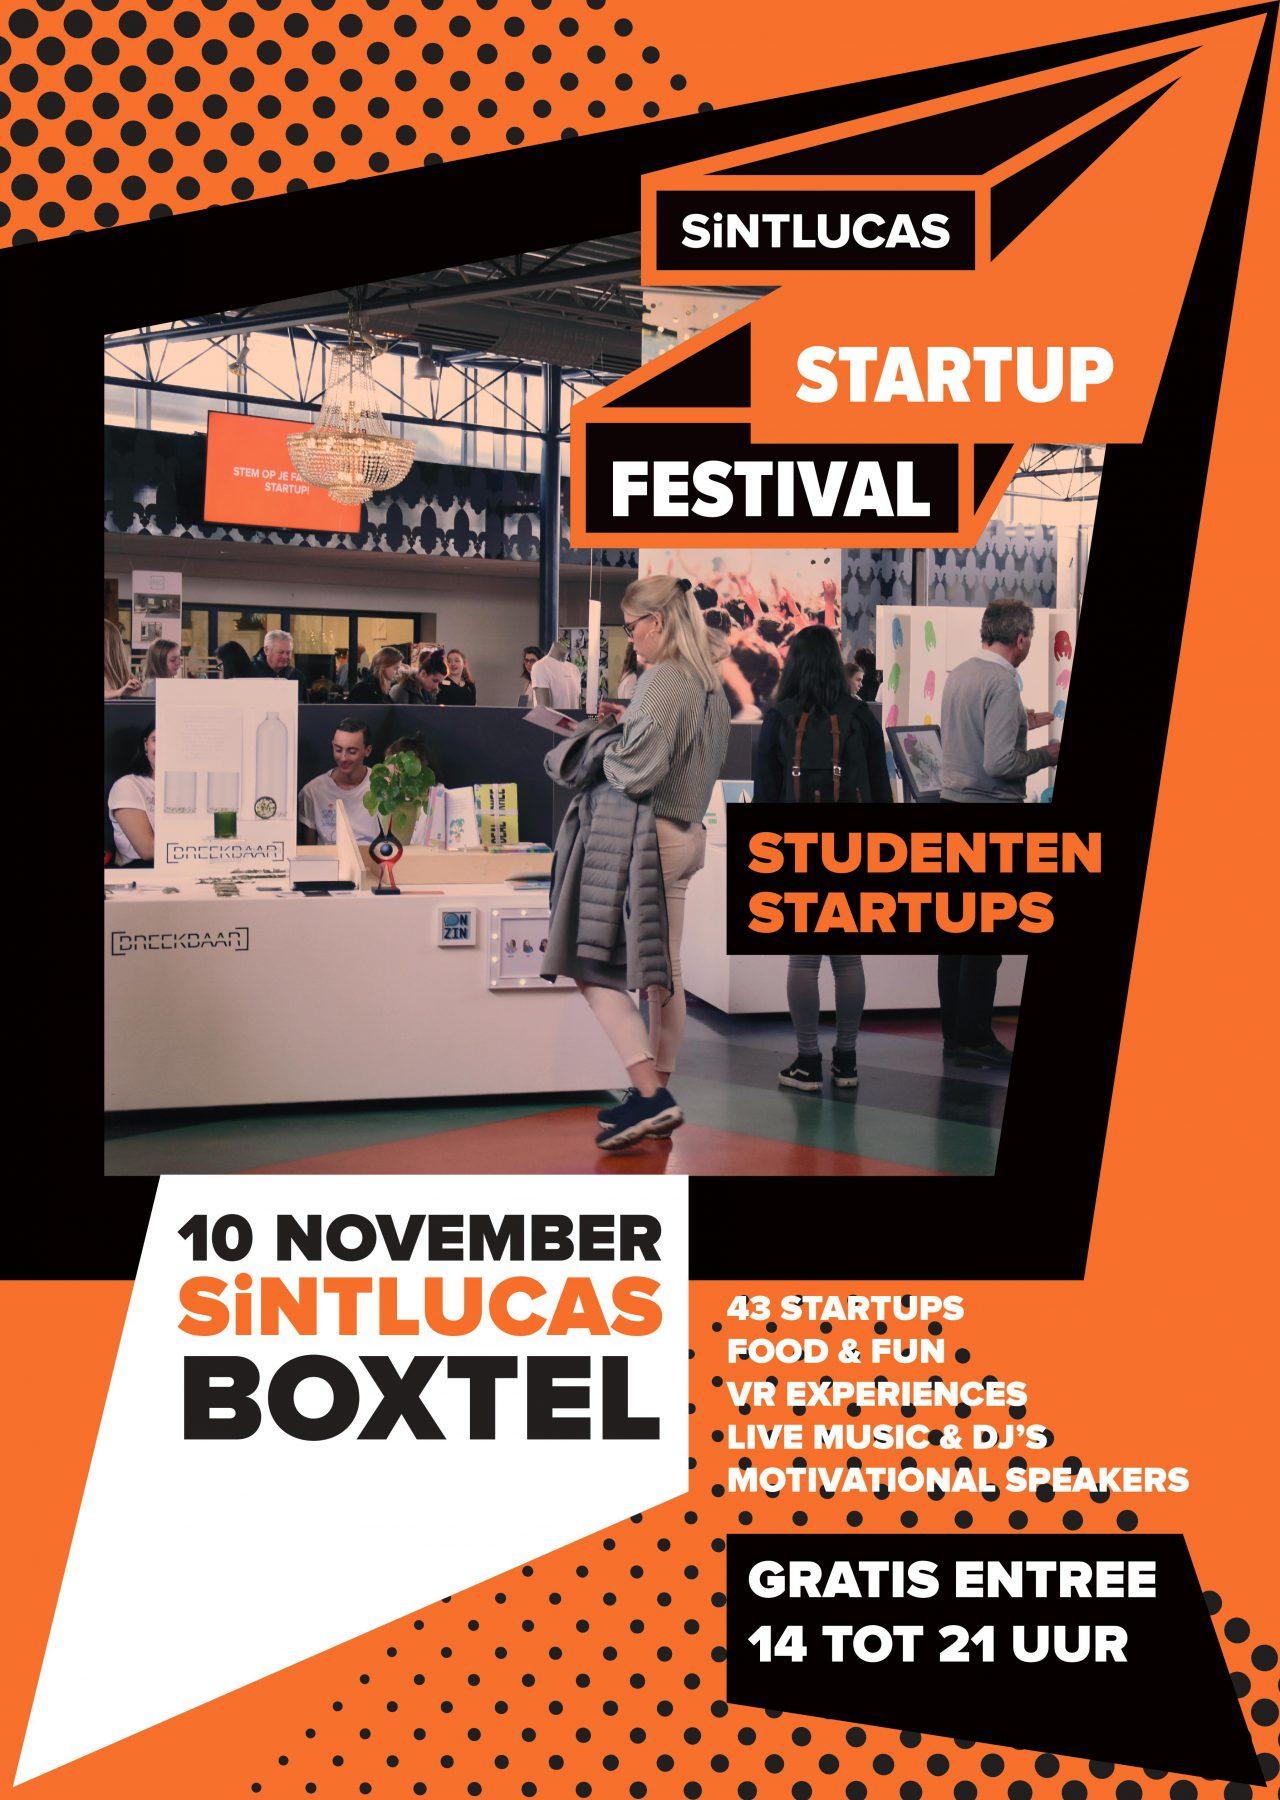 SintLucas Start-up Festival